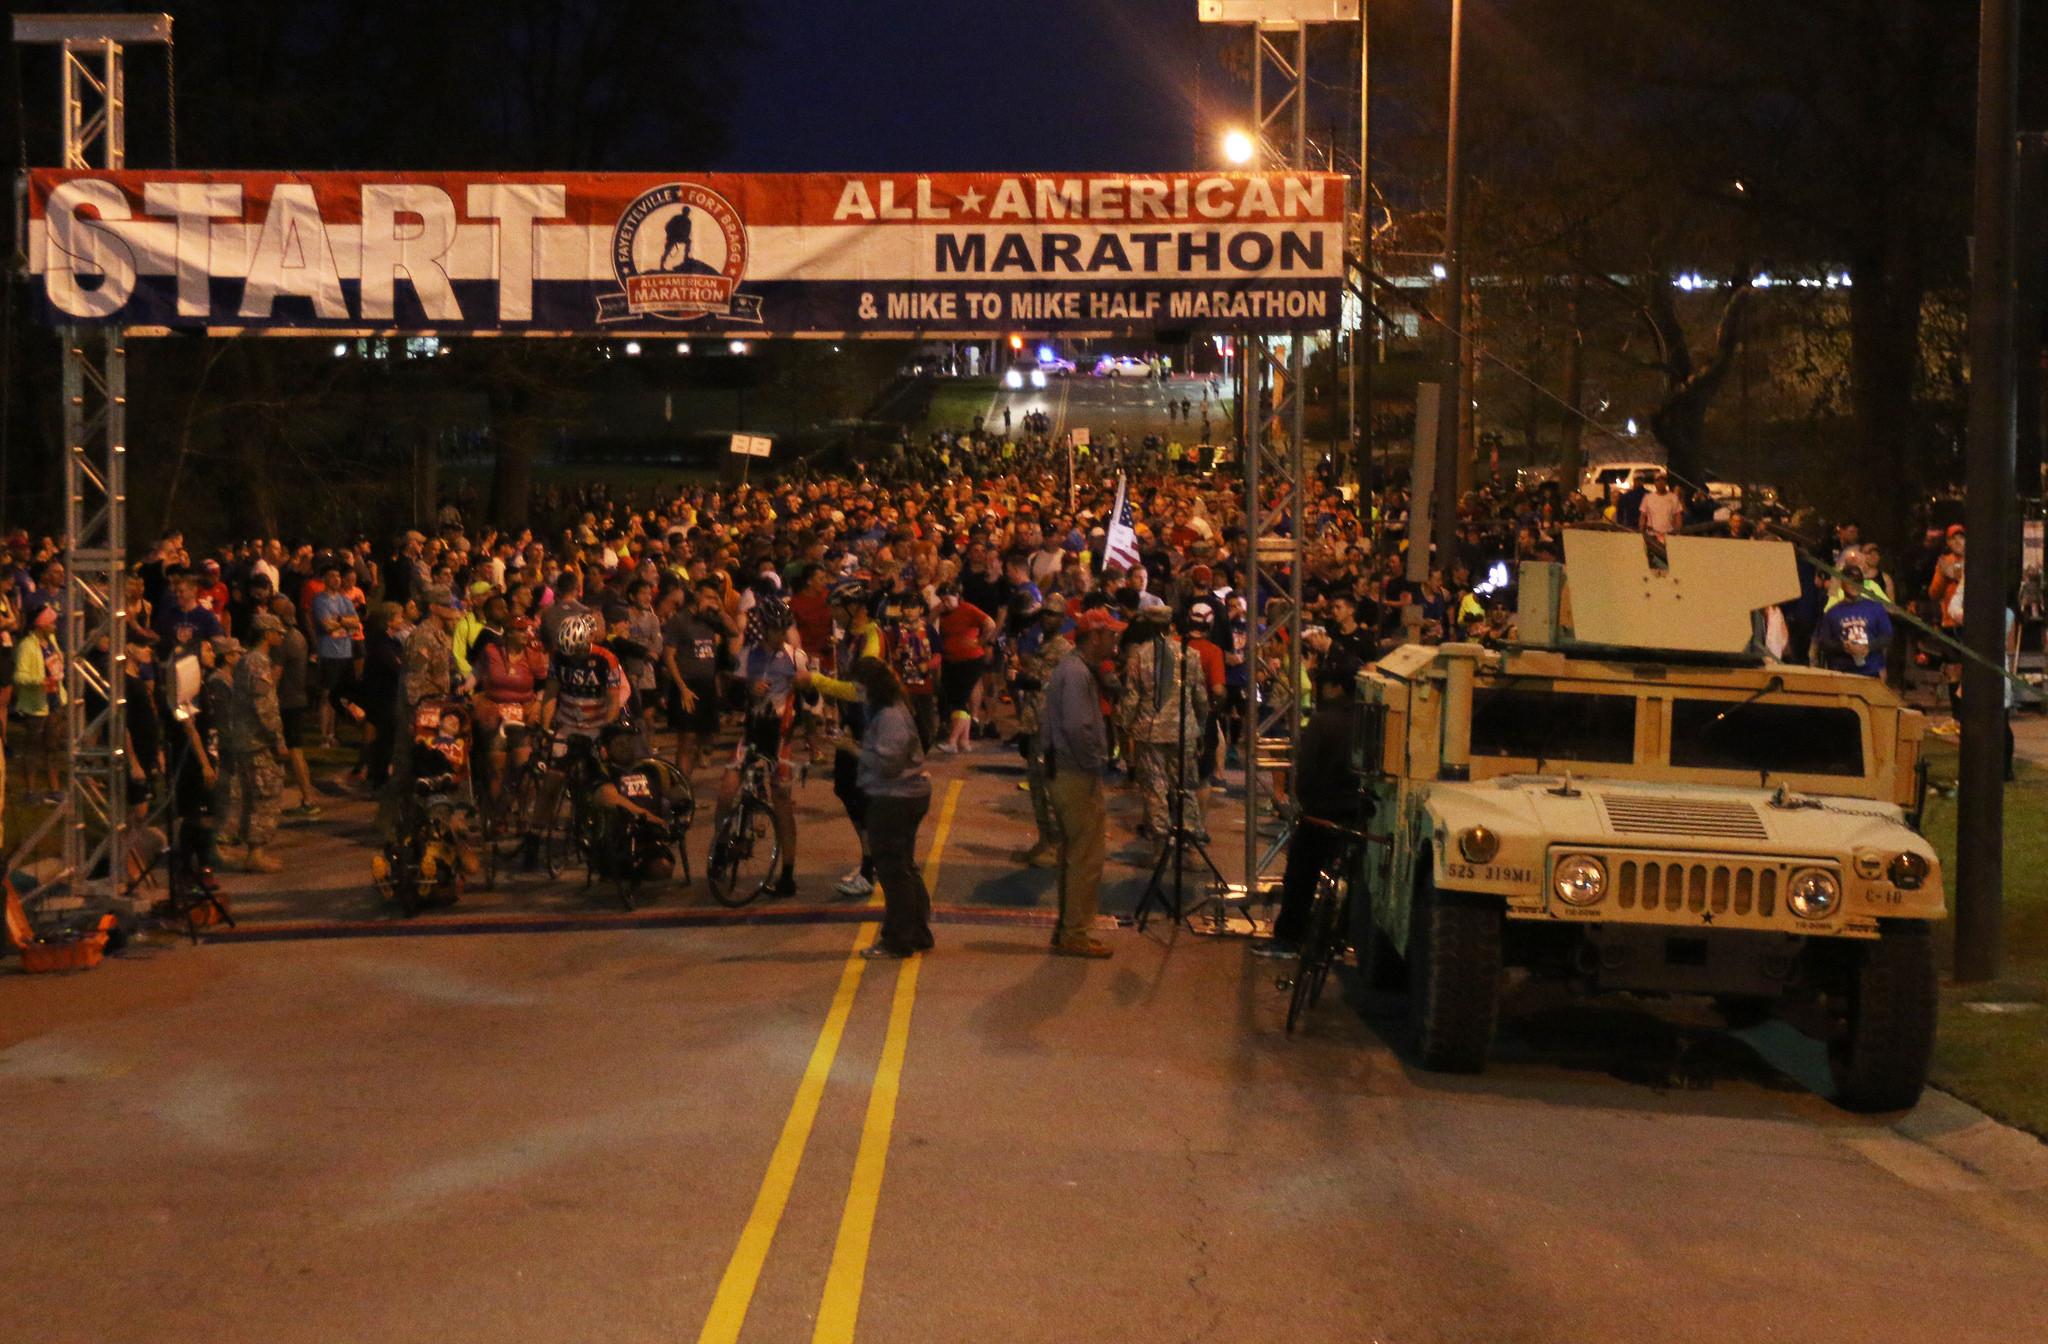 All American Marathon Start